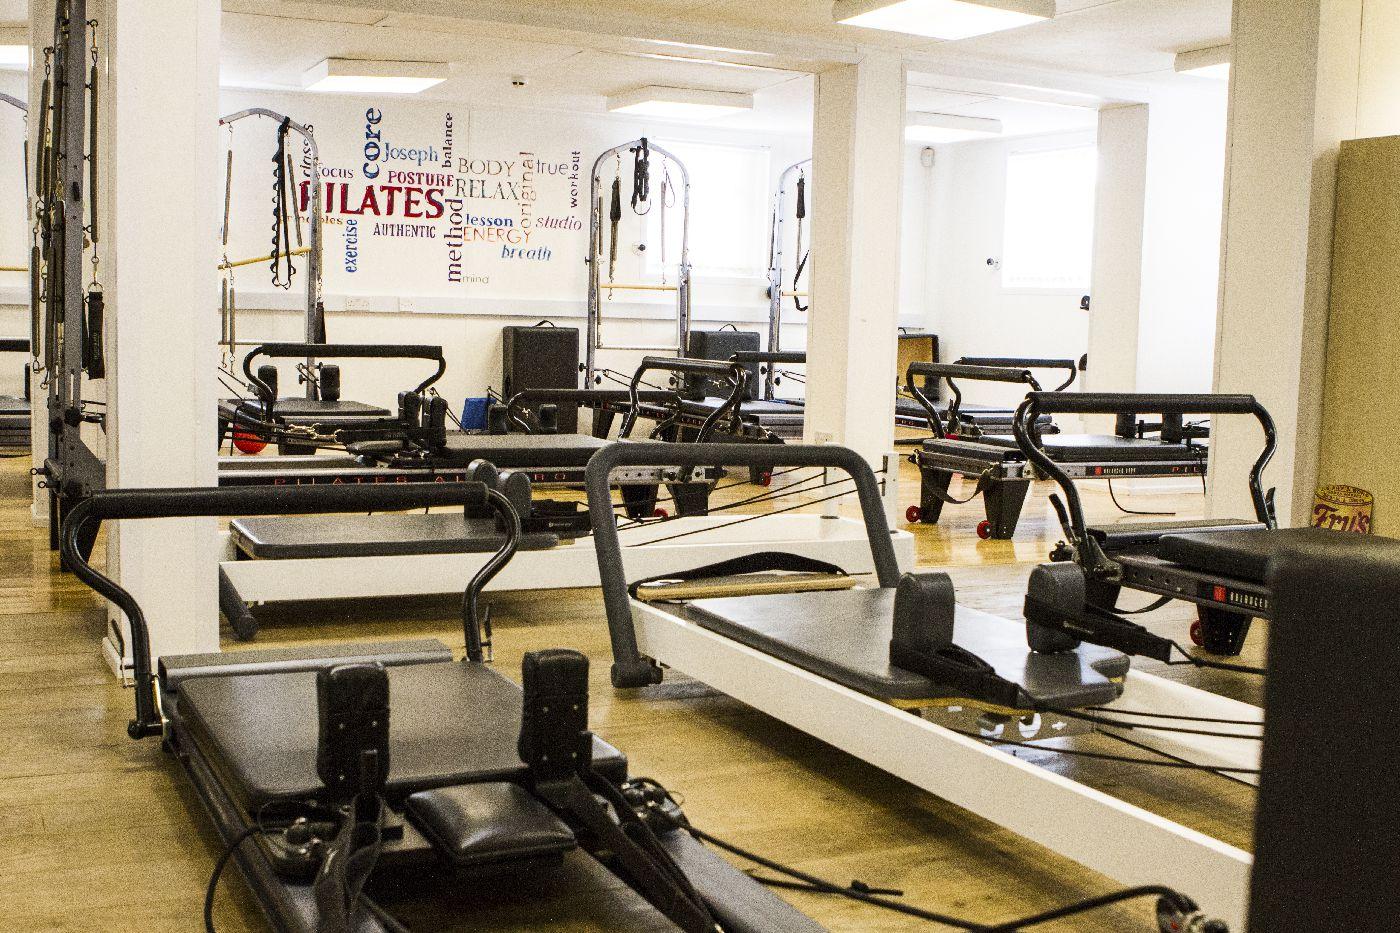 Louise O'Rourke Physiotherapy - Physio Led - Platinum Pilates Reformer Pilates Studio - Citywest Dublin